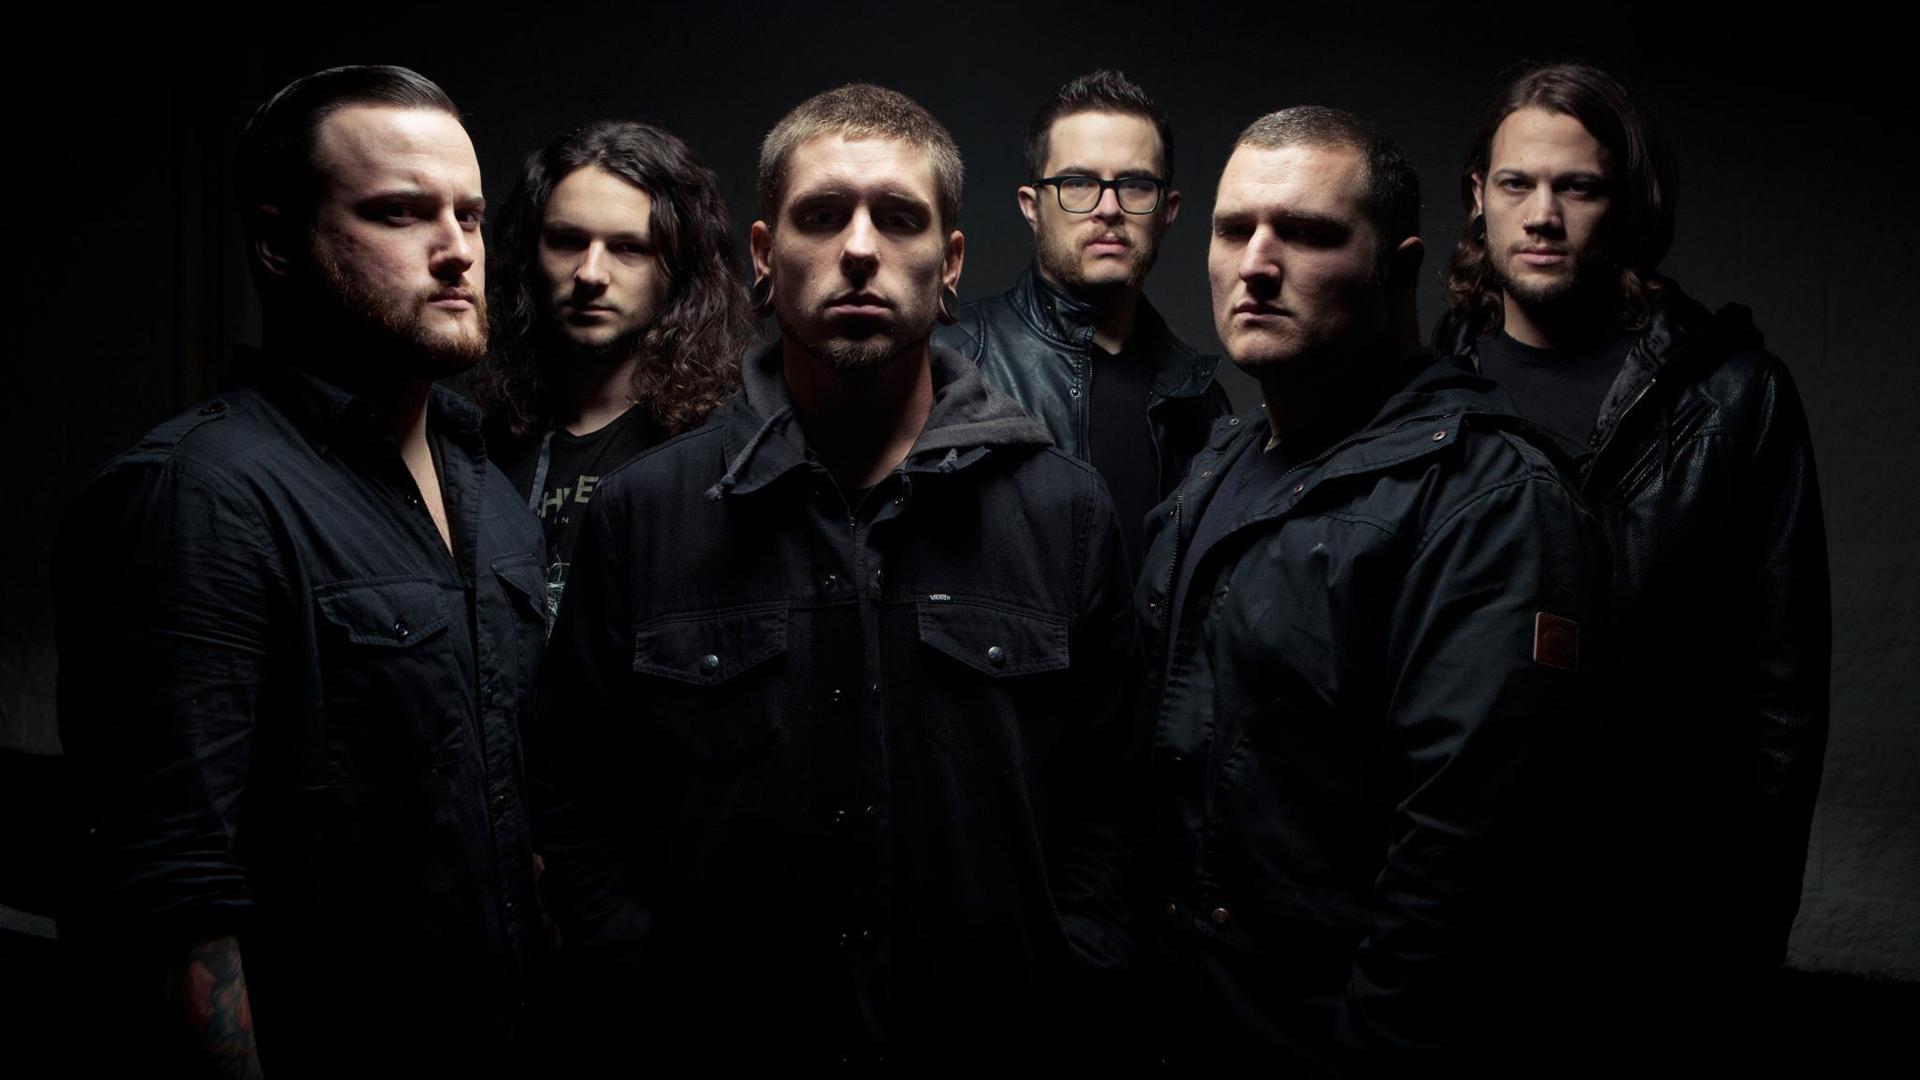 whitechapel deathcore heavy metal alternative metal g